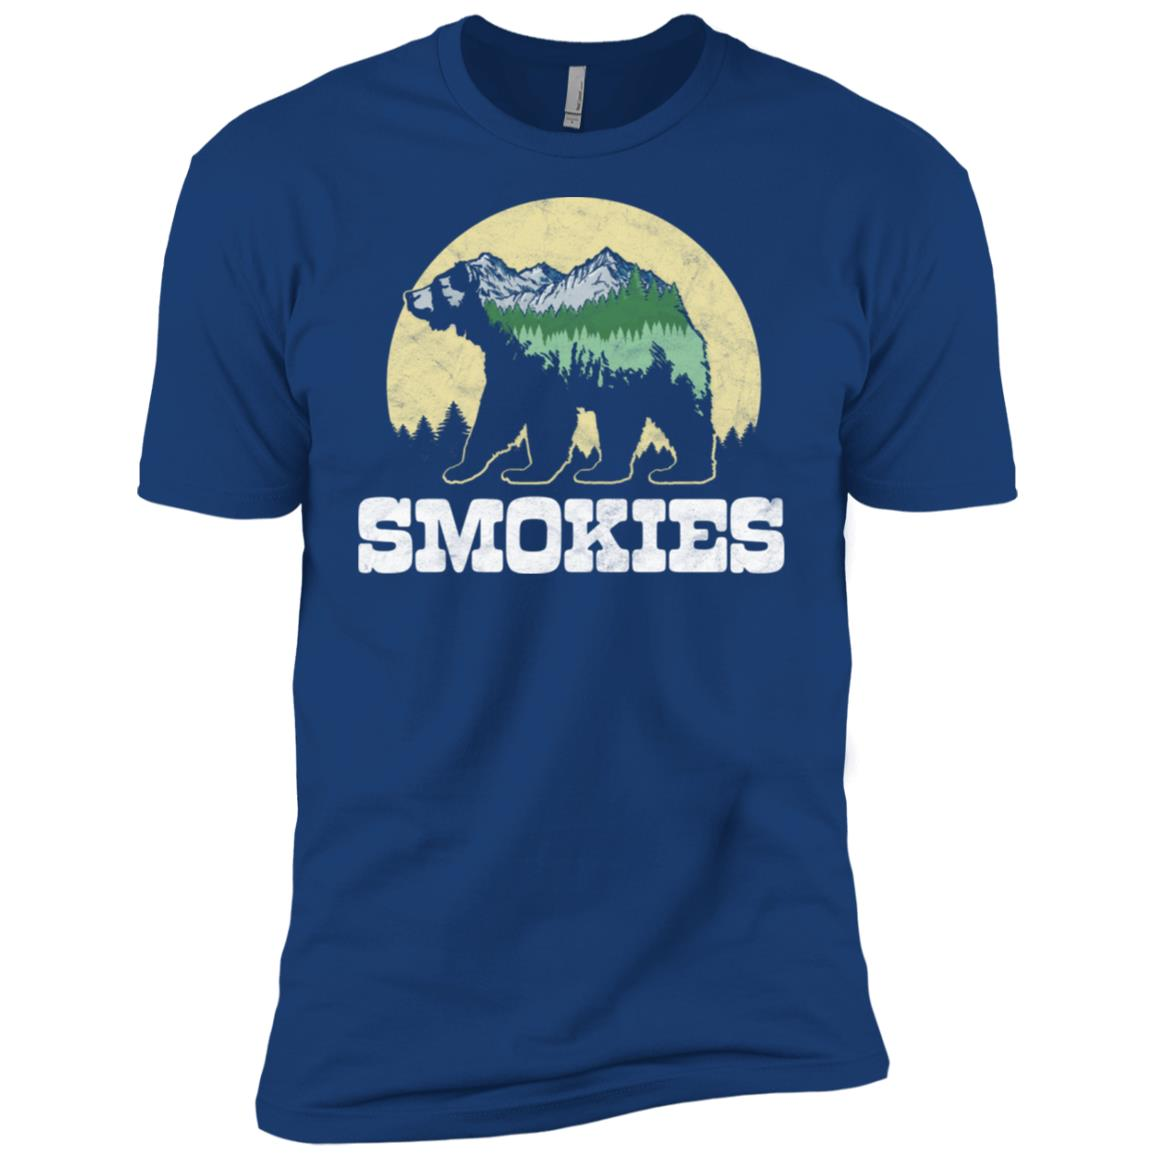 The Smokies Bear Sketch Mountains & Trees Men Short Sleeve T-Shirt